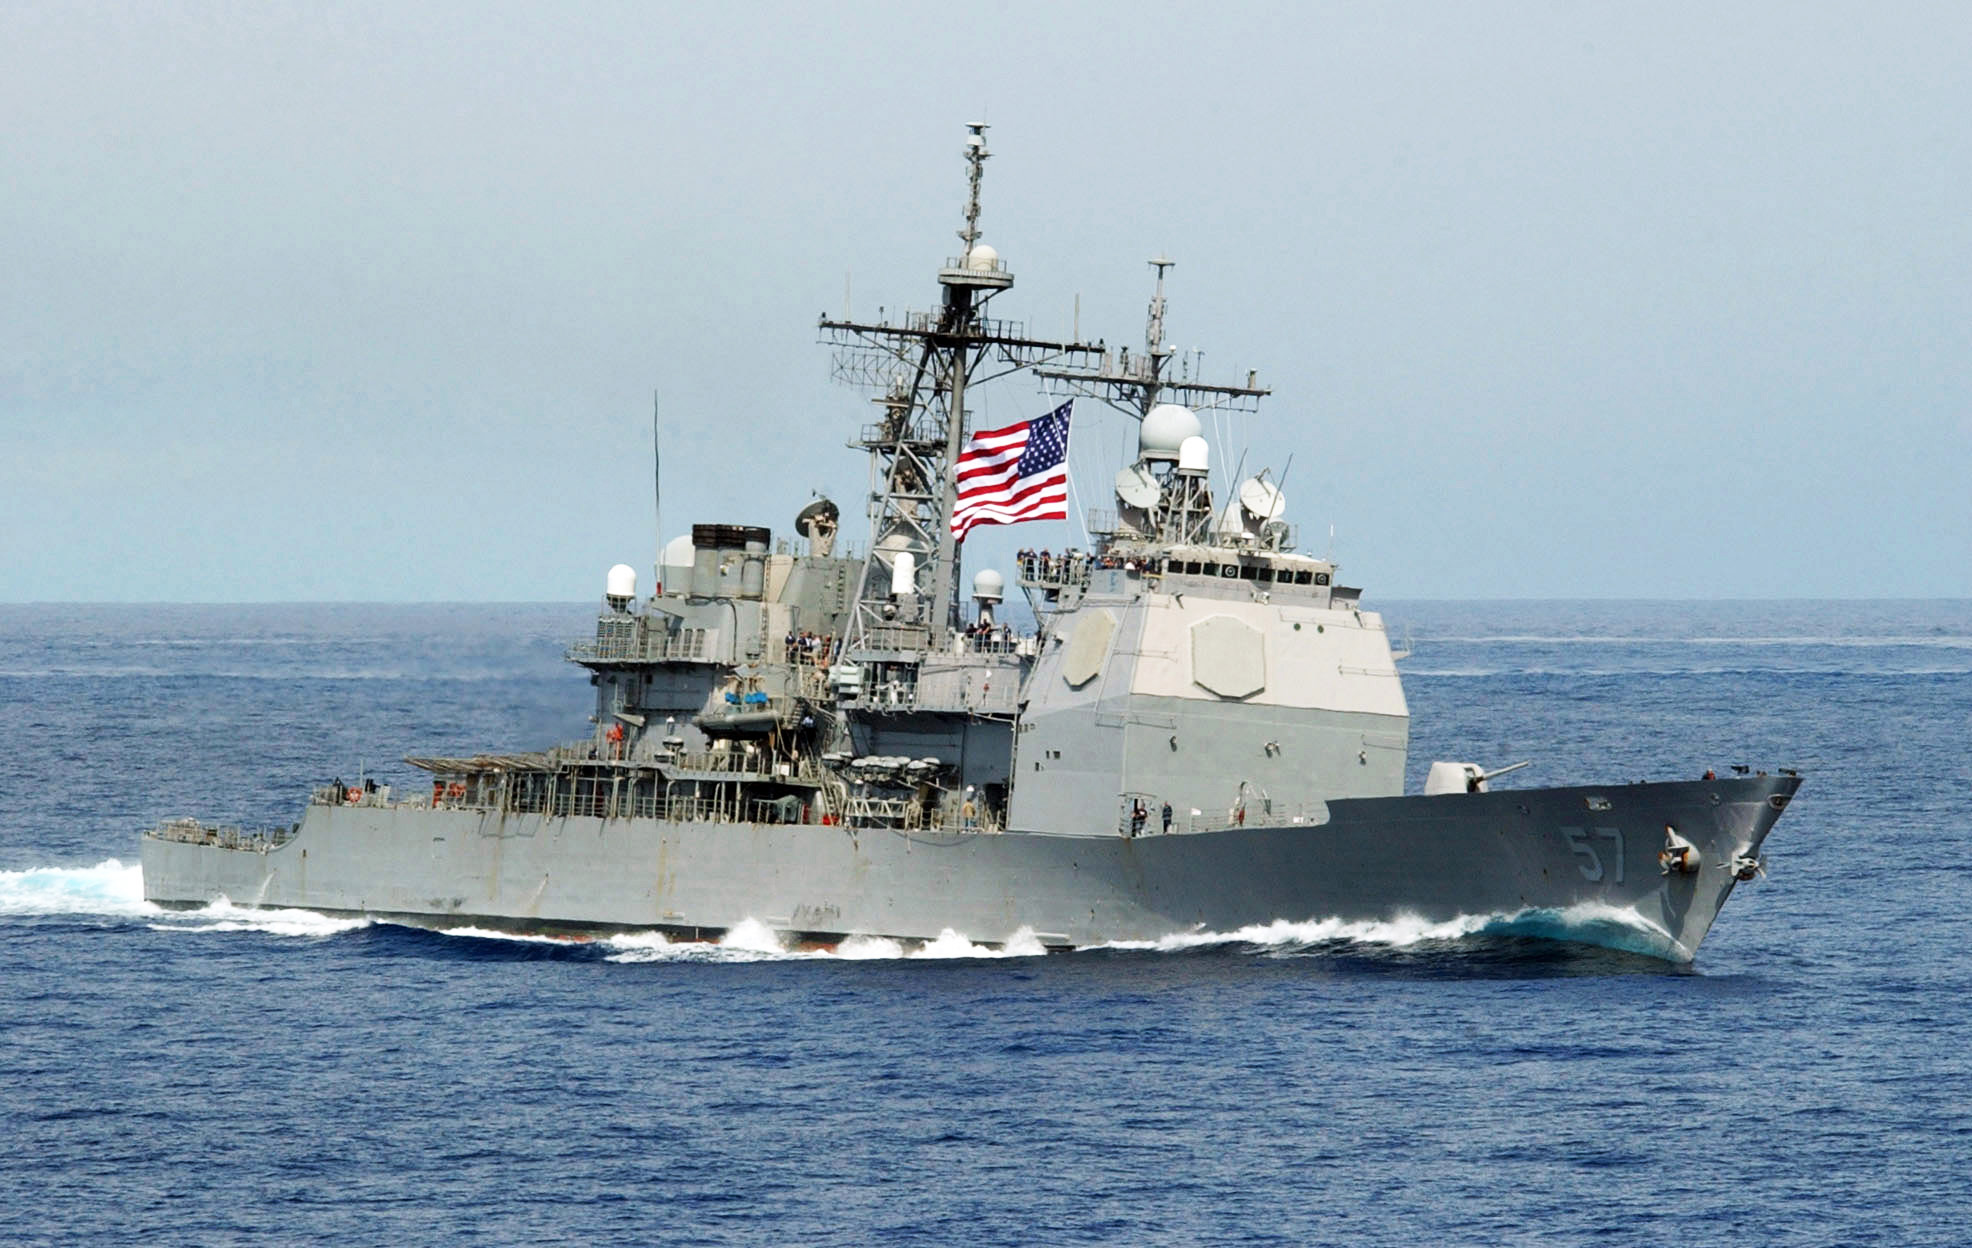 Ticonderoga class guided missile cruiser